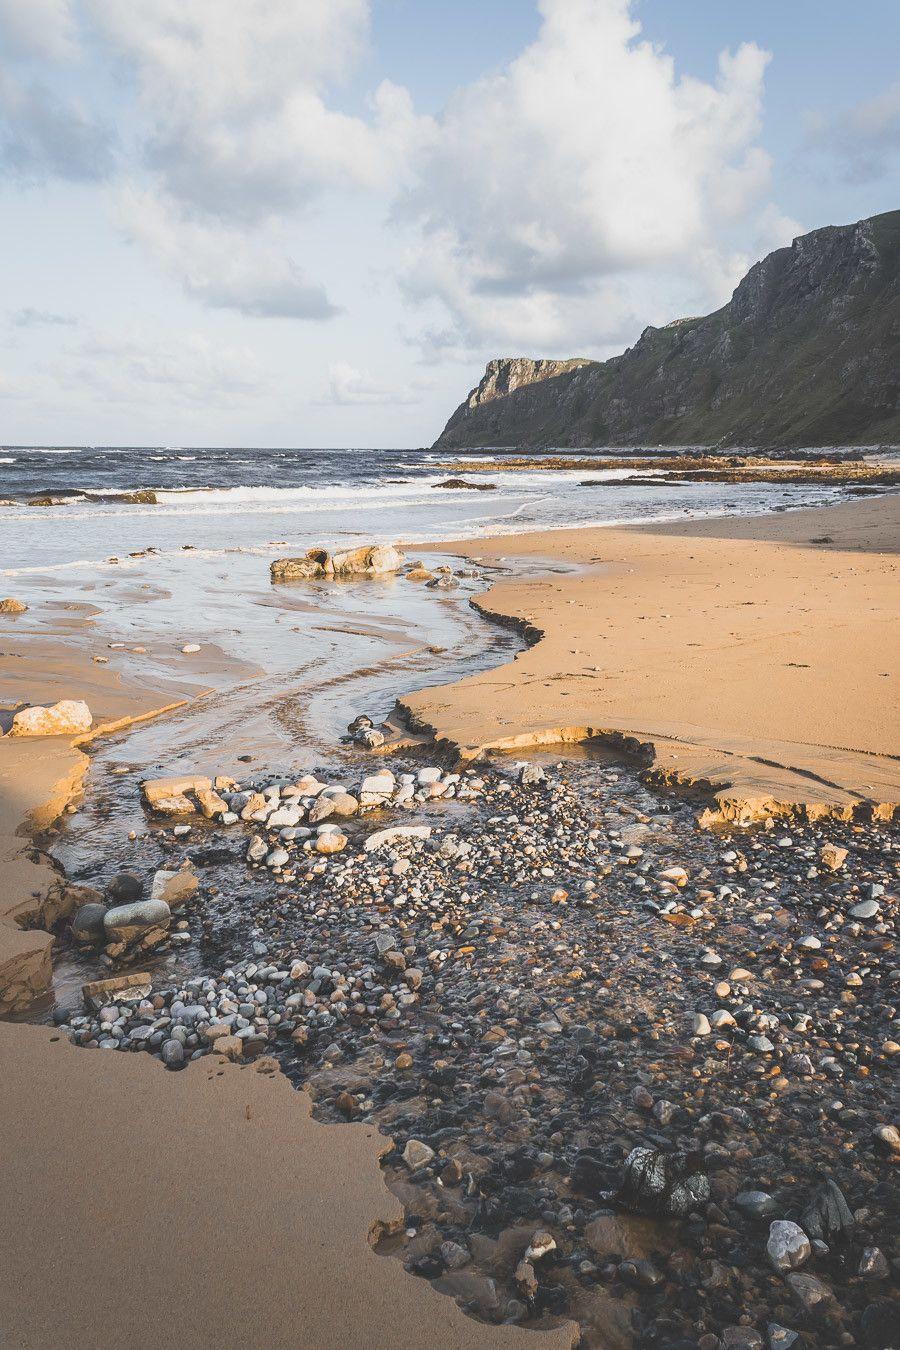 road trip iralnde - plage de sable fin